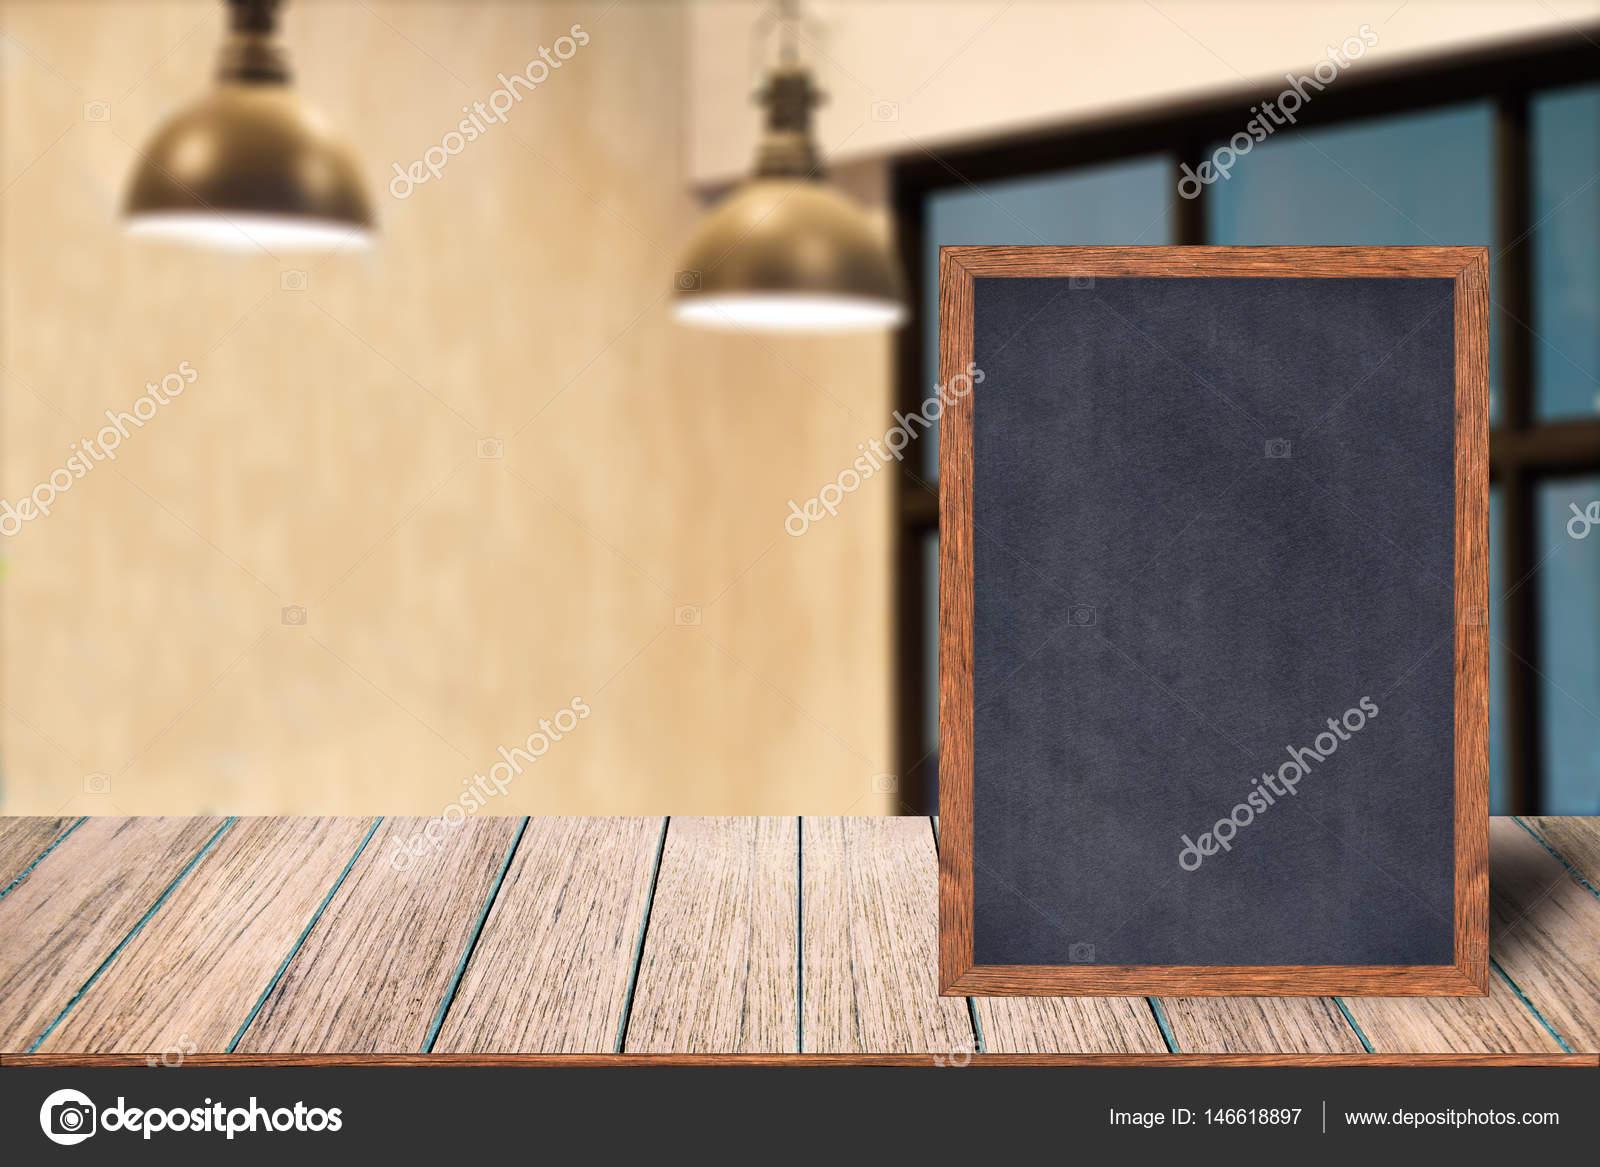 Menú de muestra de pizarra marco madera pizarra — Foto de stock ...